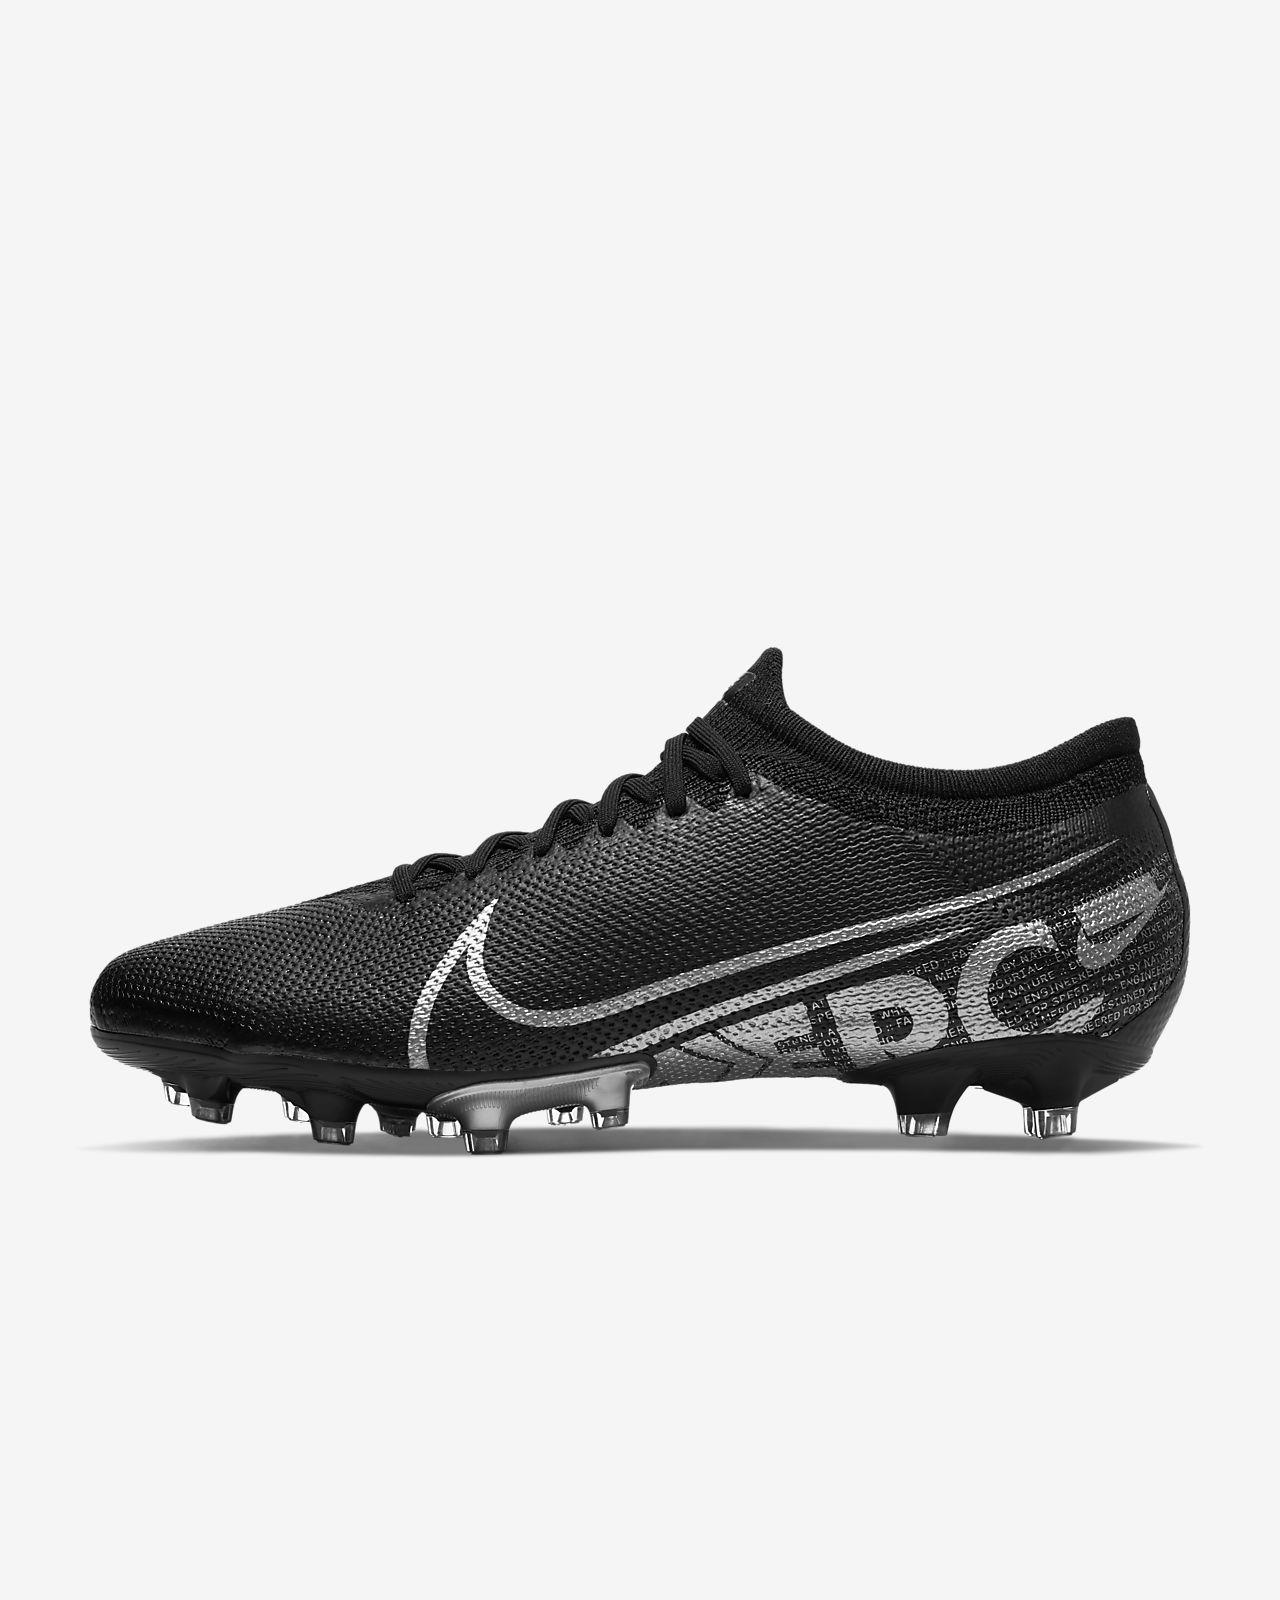 Chaussure de foot Nike Mercurial Vapor XIII Club Turf